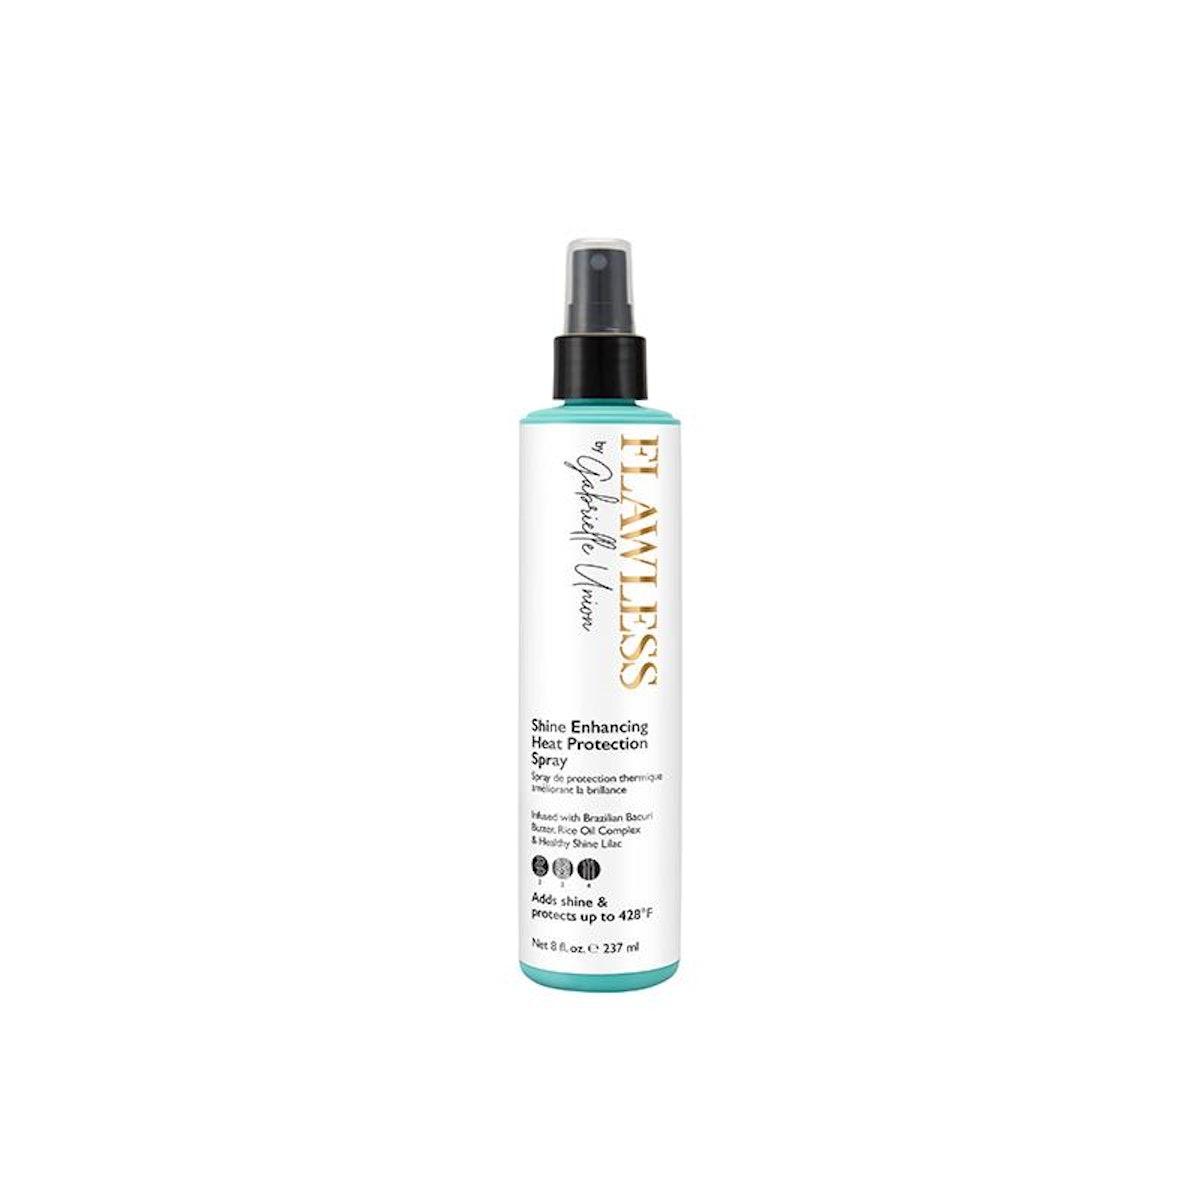 Flawless Shine Enhancing Heat Protection Spray